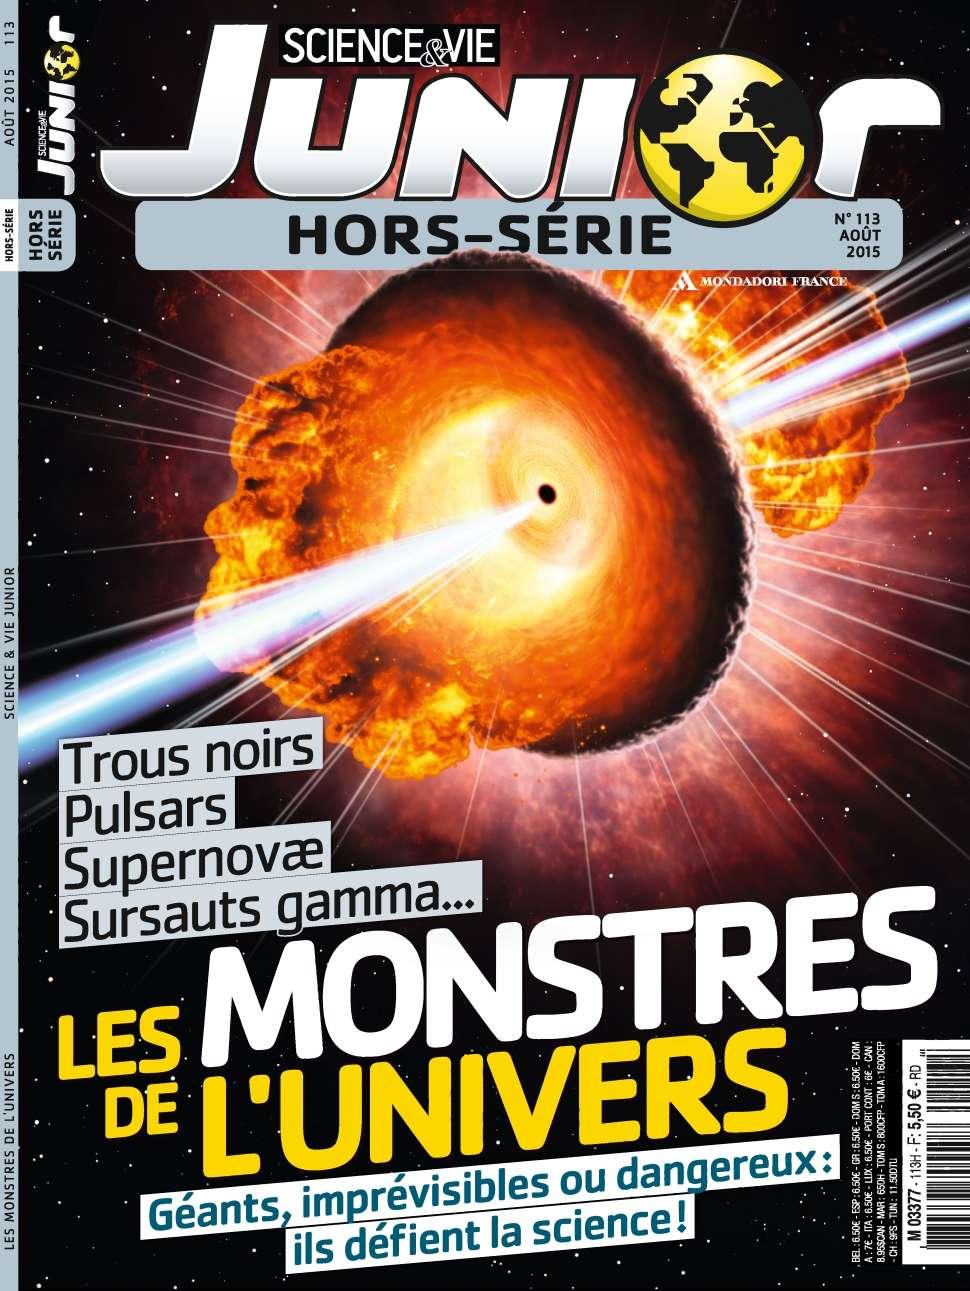 Science & Vie Junior Hors-Série 113 - Août 2015